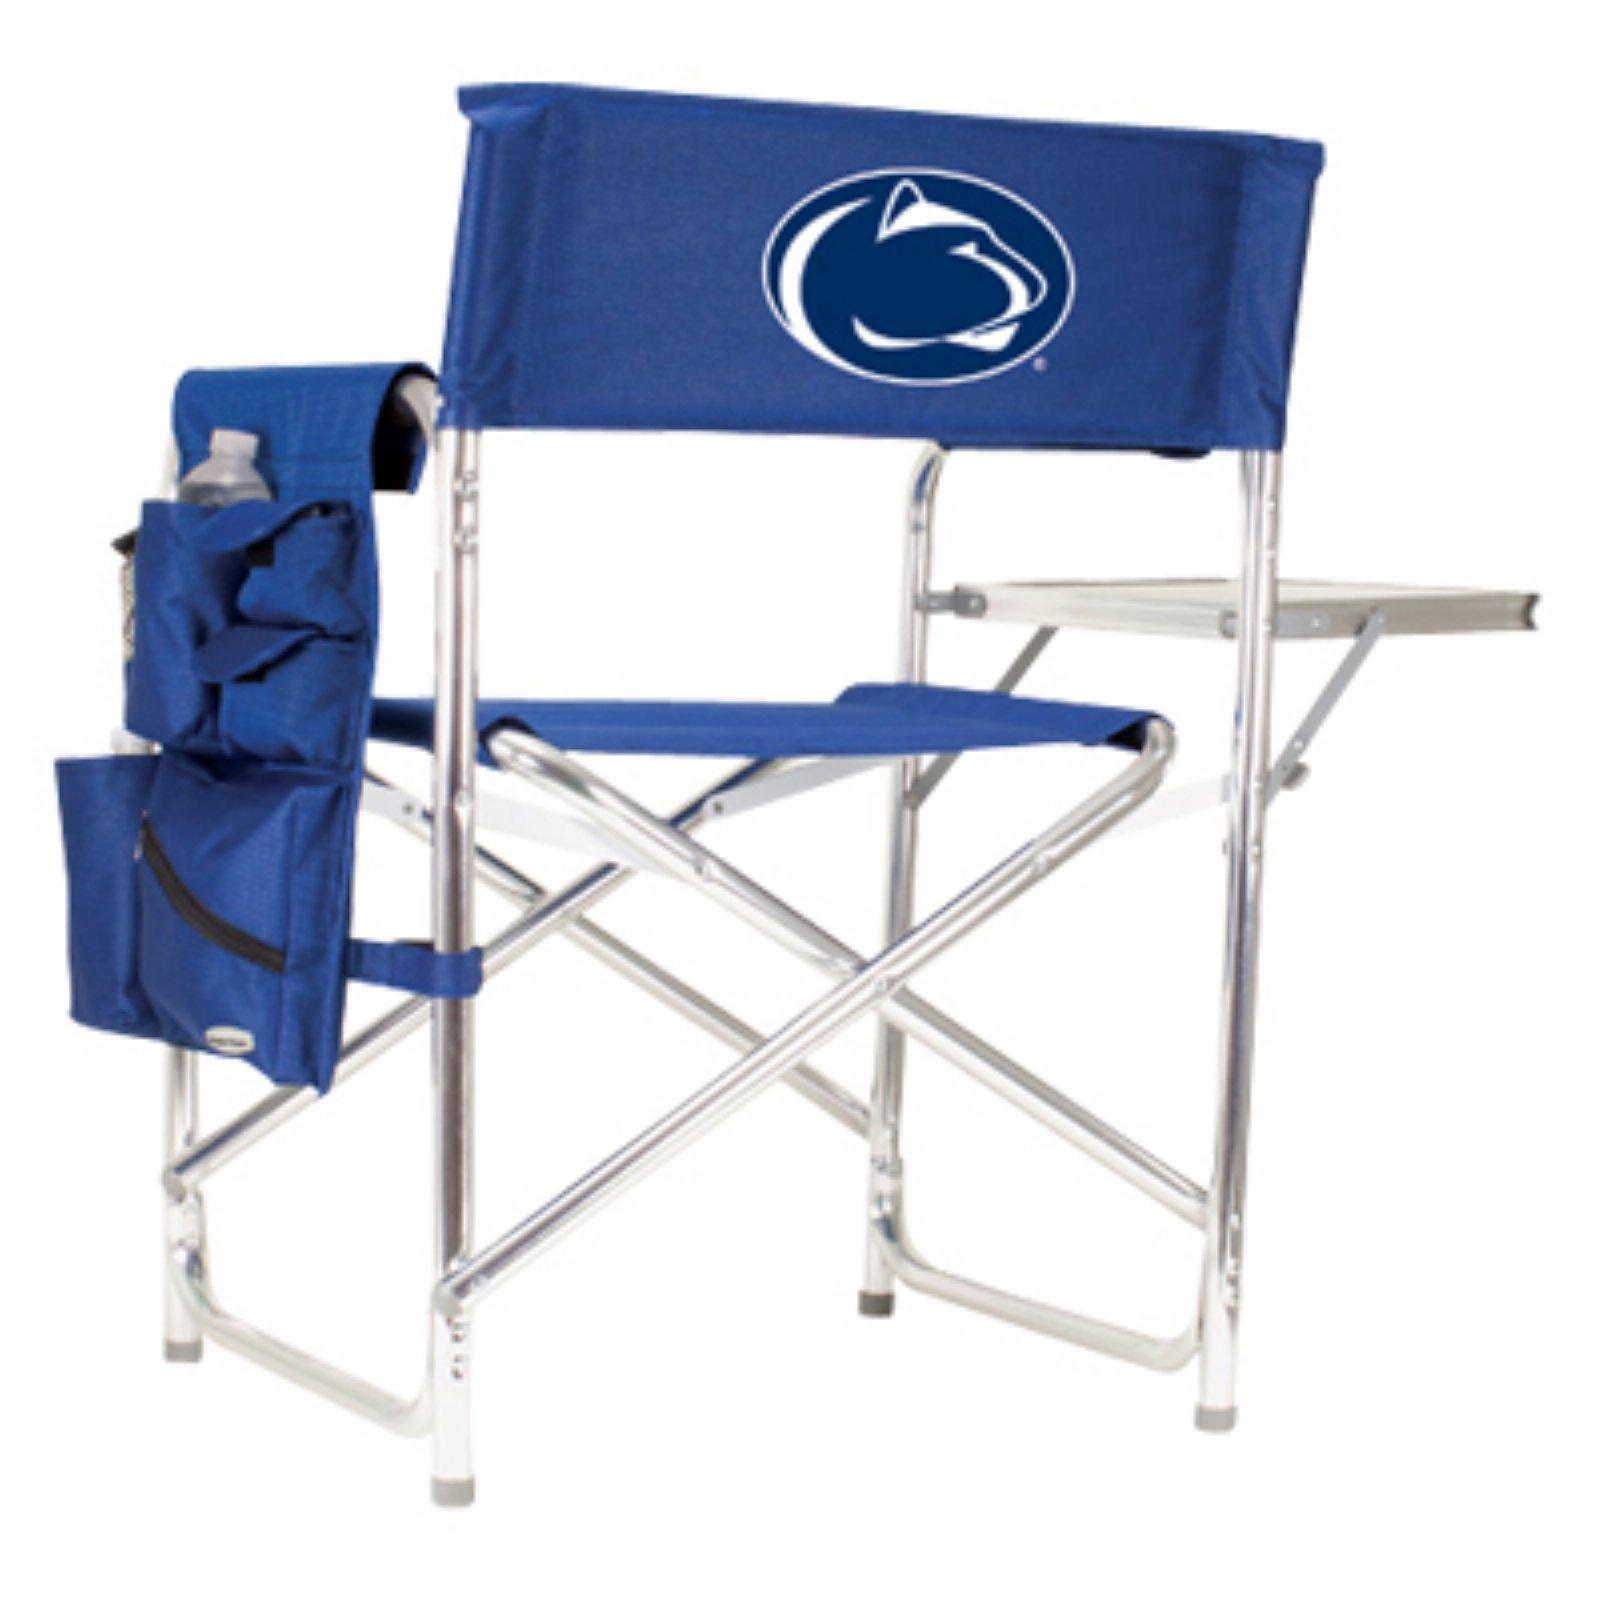 Picnic Time Collegiate Folding Sports Chair